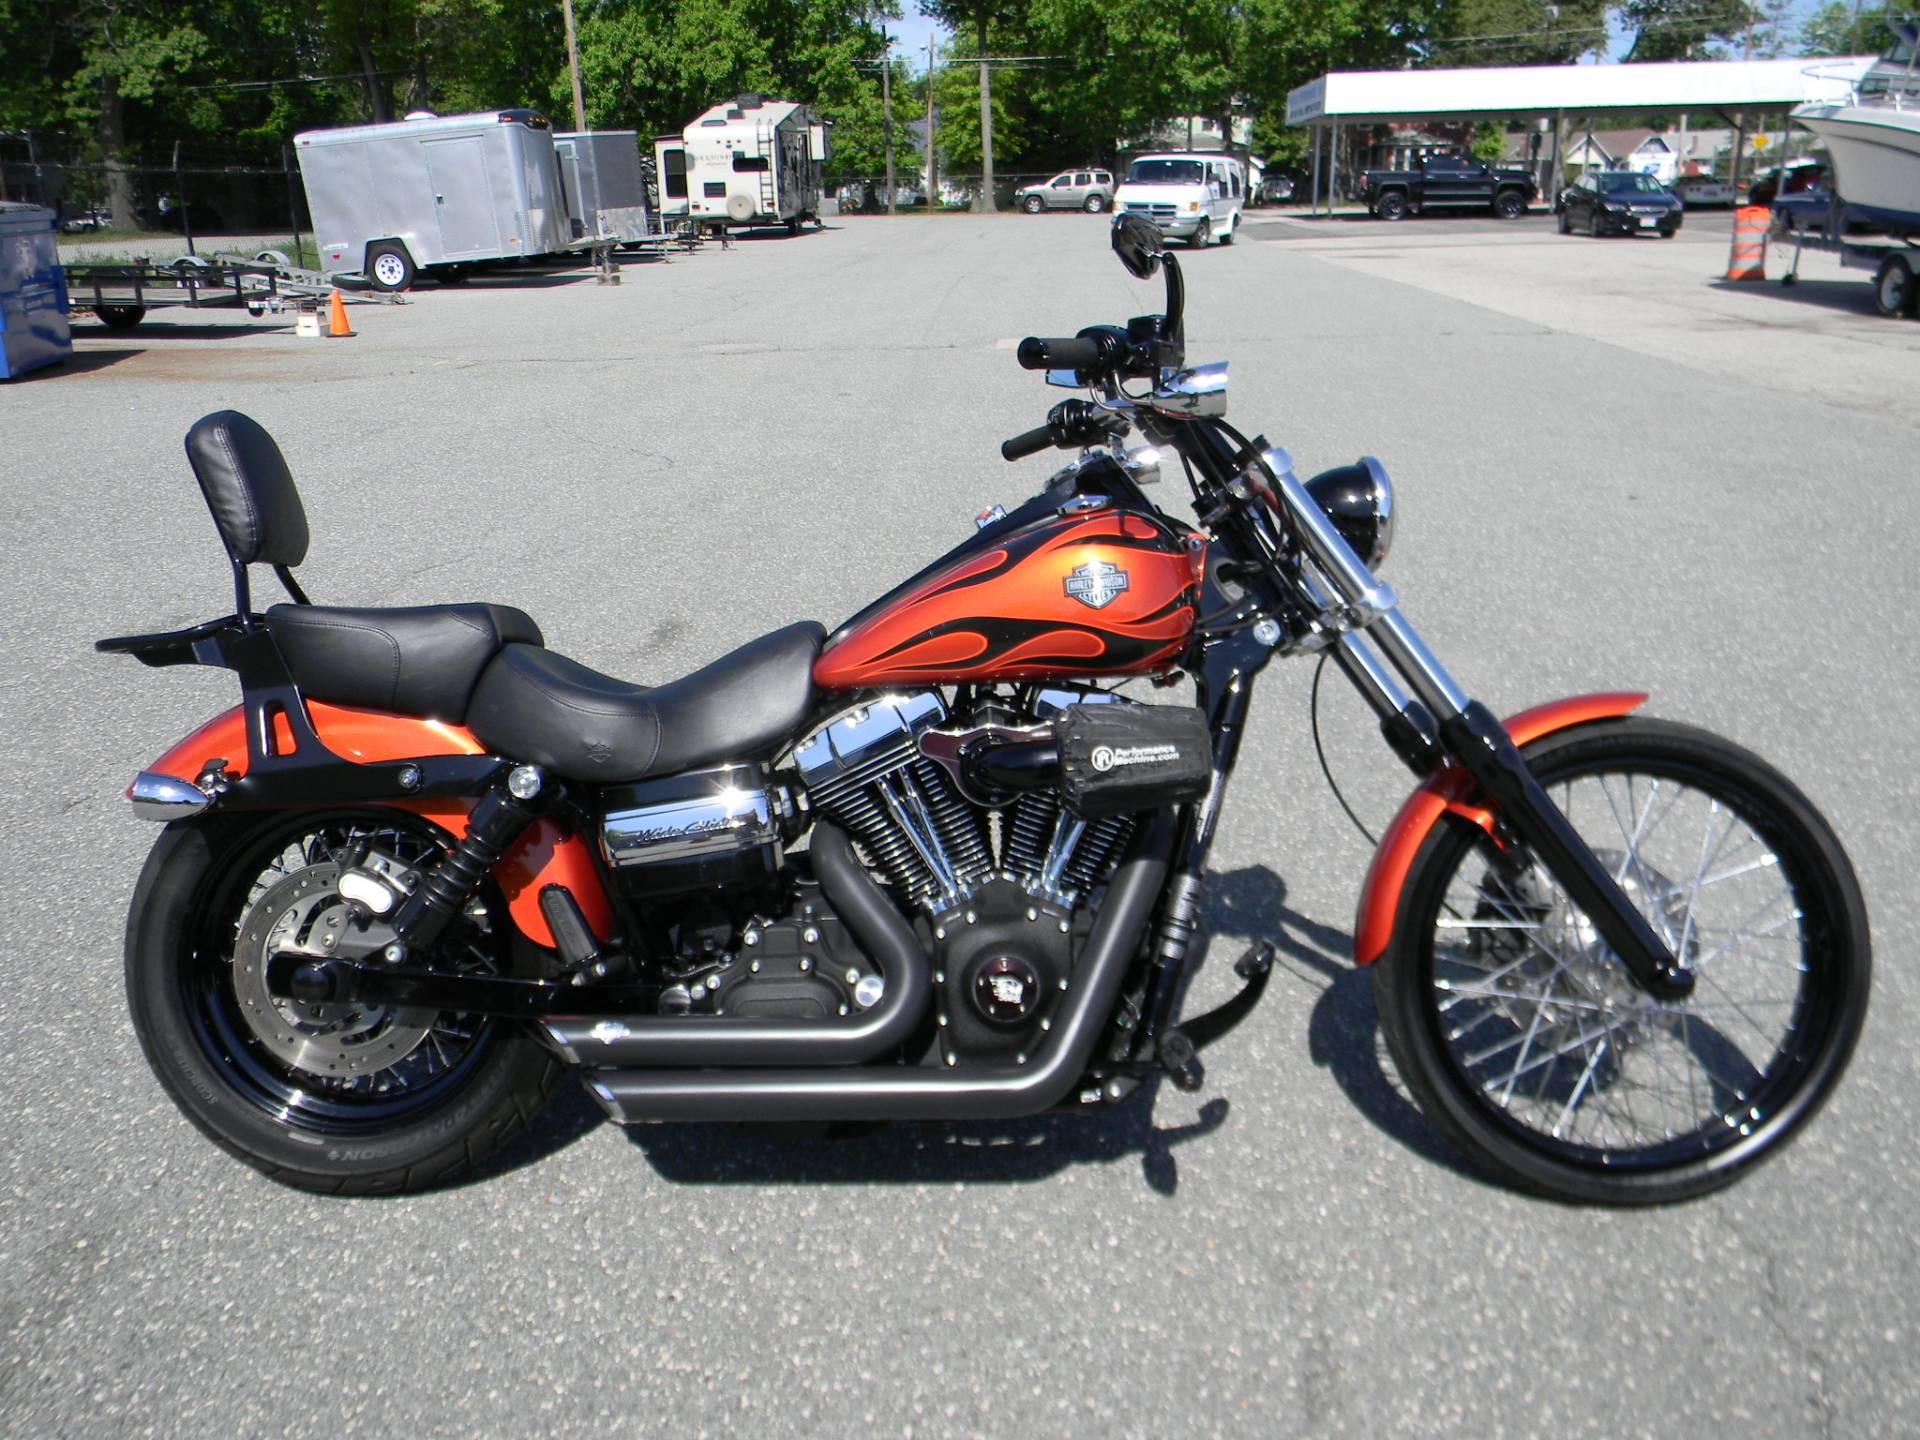 Harley Dyna Wide Glide >> 2011 Harley Davidson Dyna Wide Glide Motorcycles Springfield